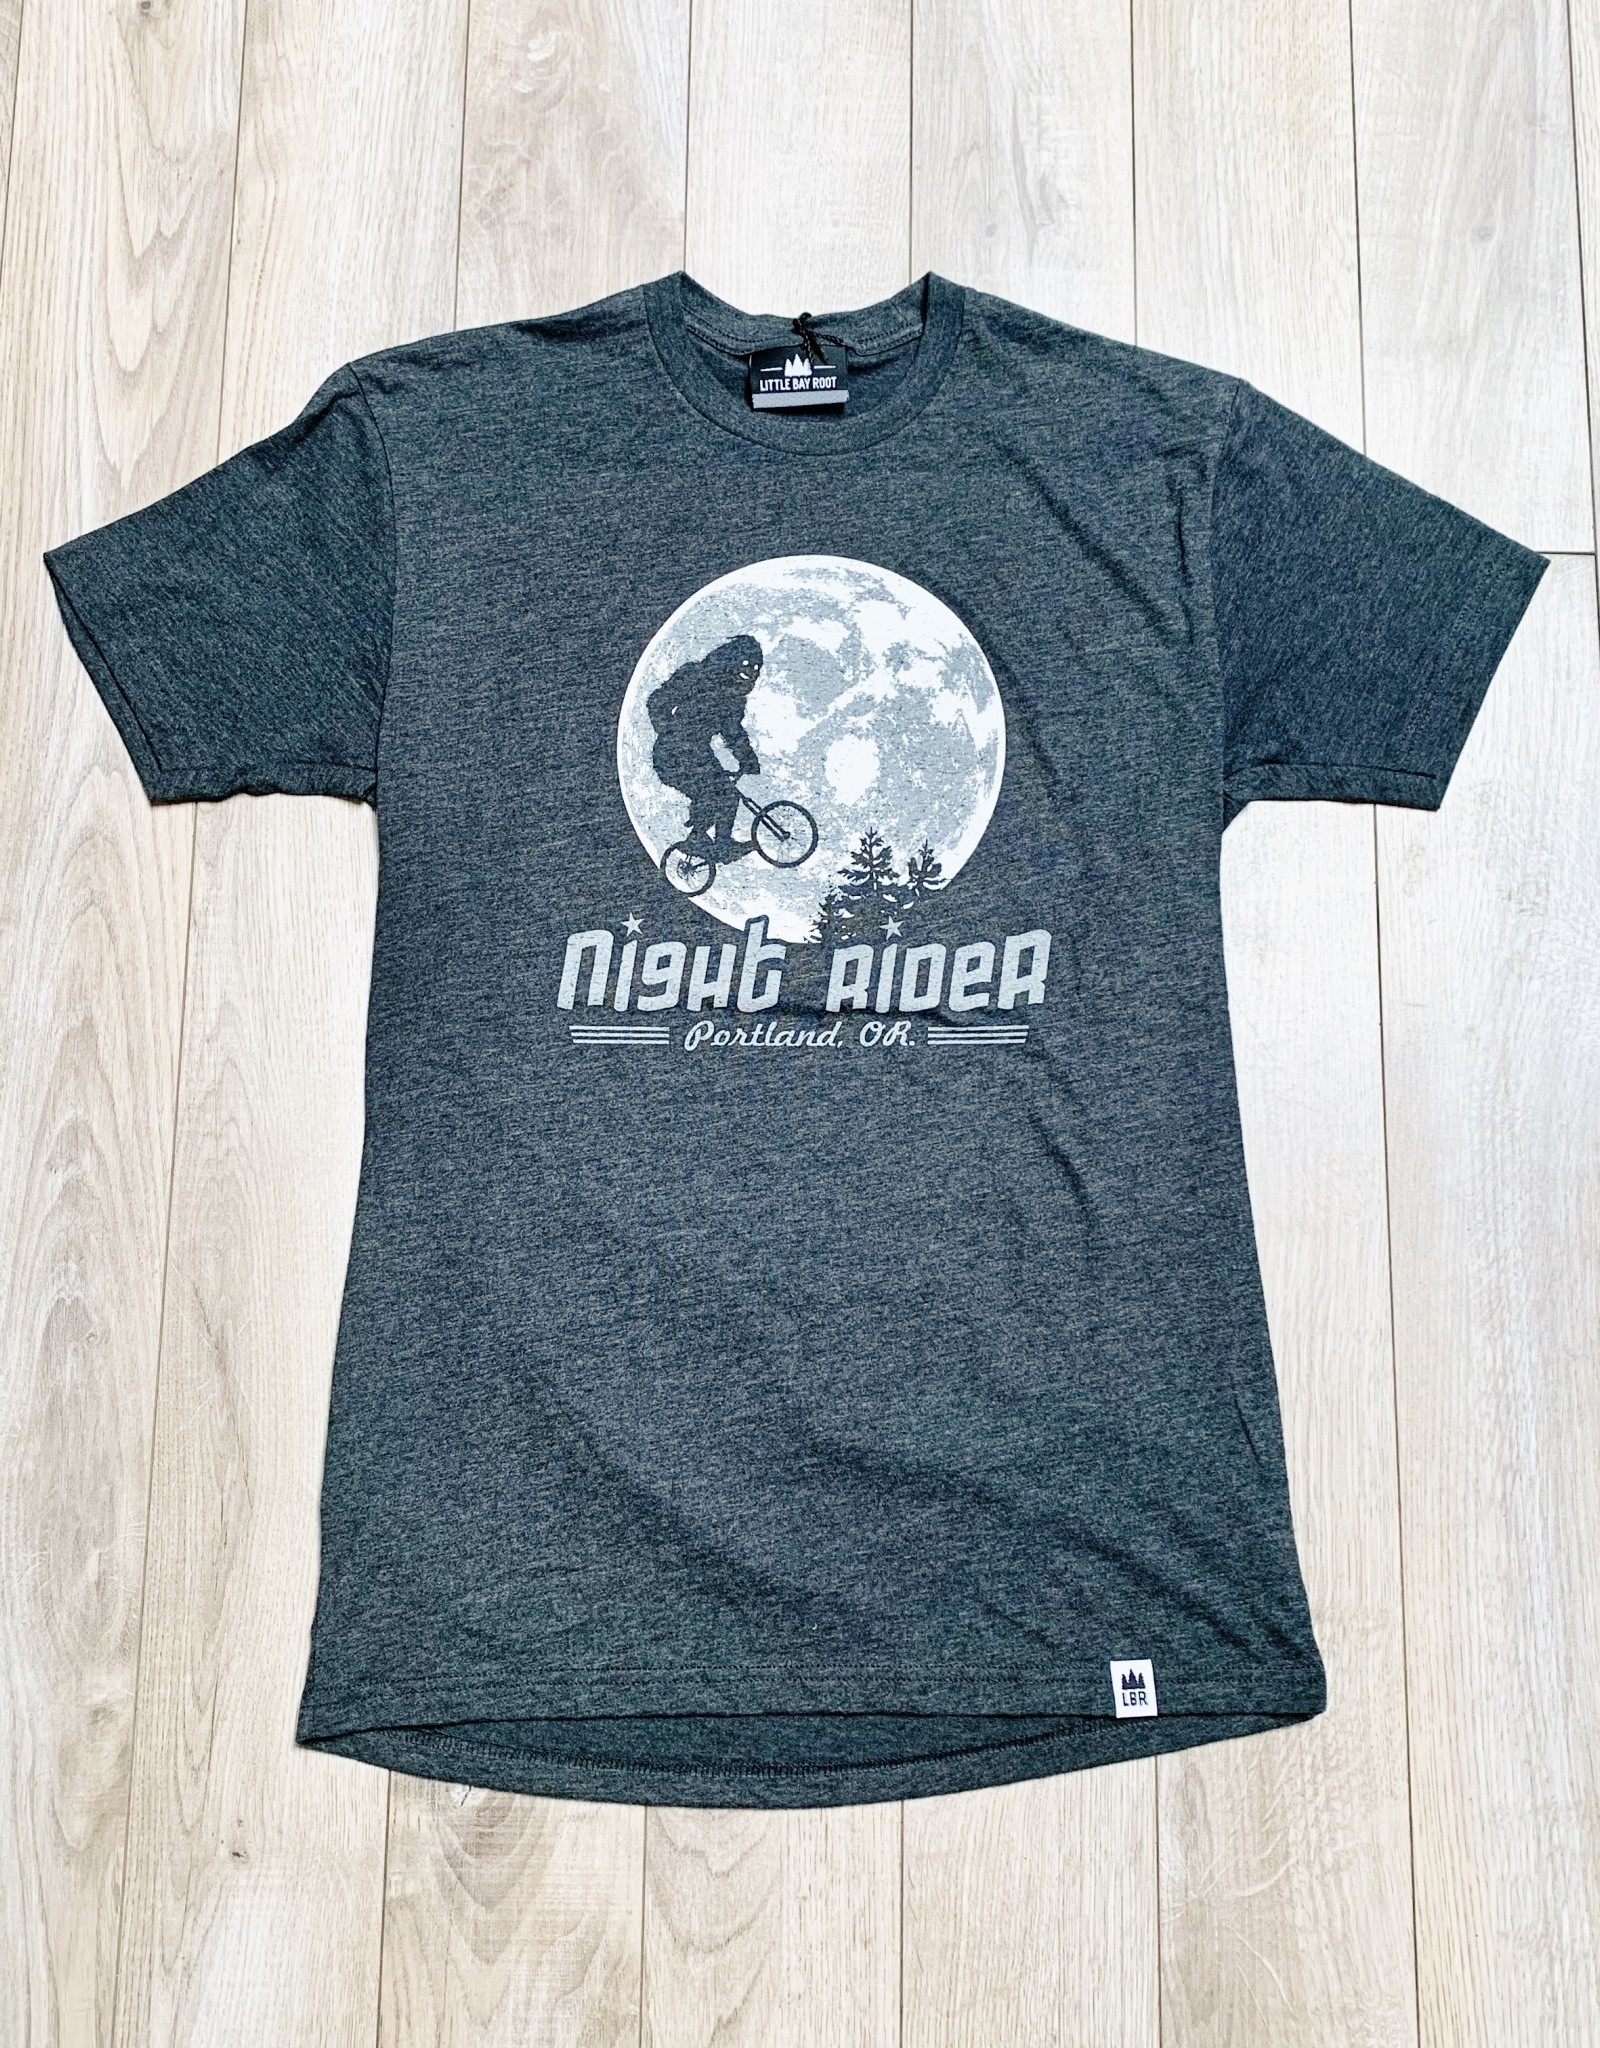 Little Bay Root Night Rider T-Shirt